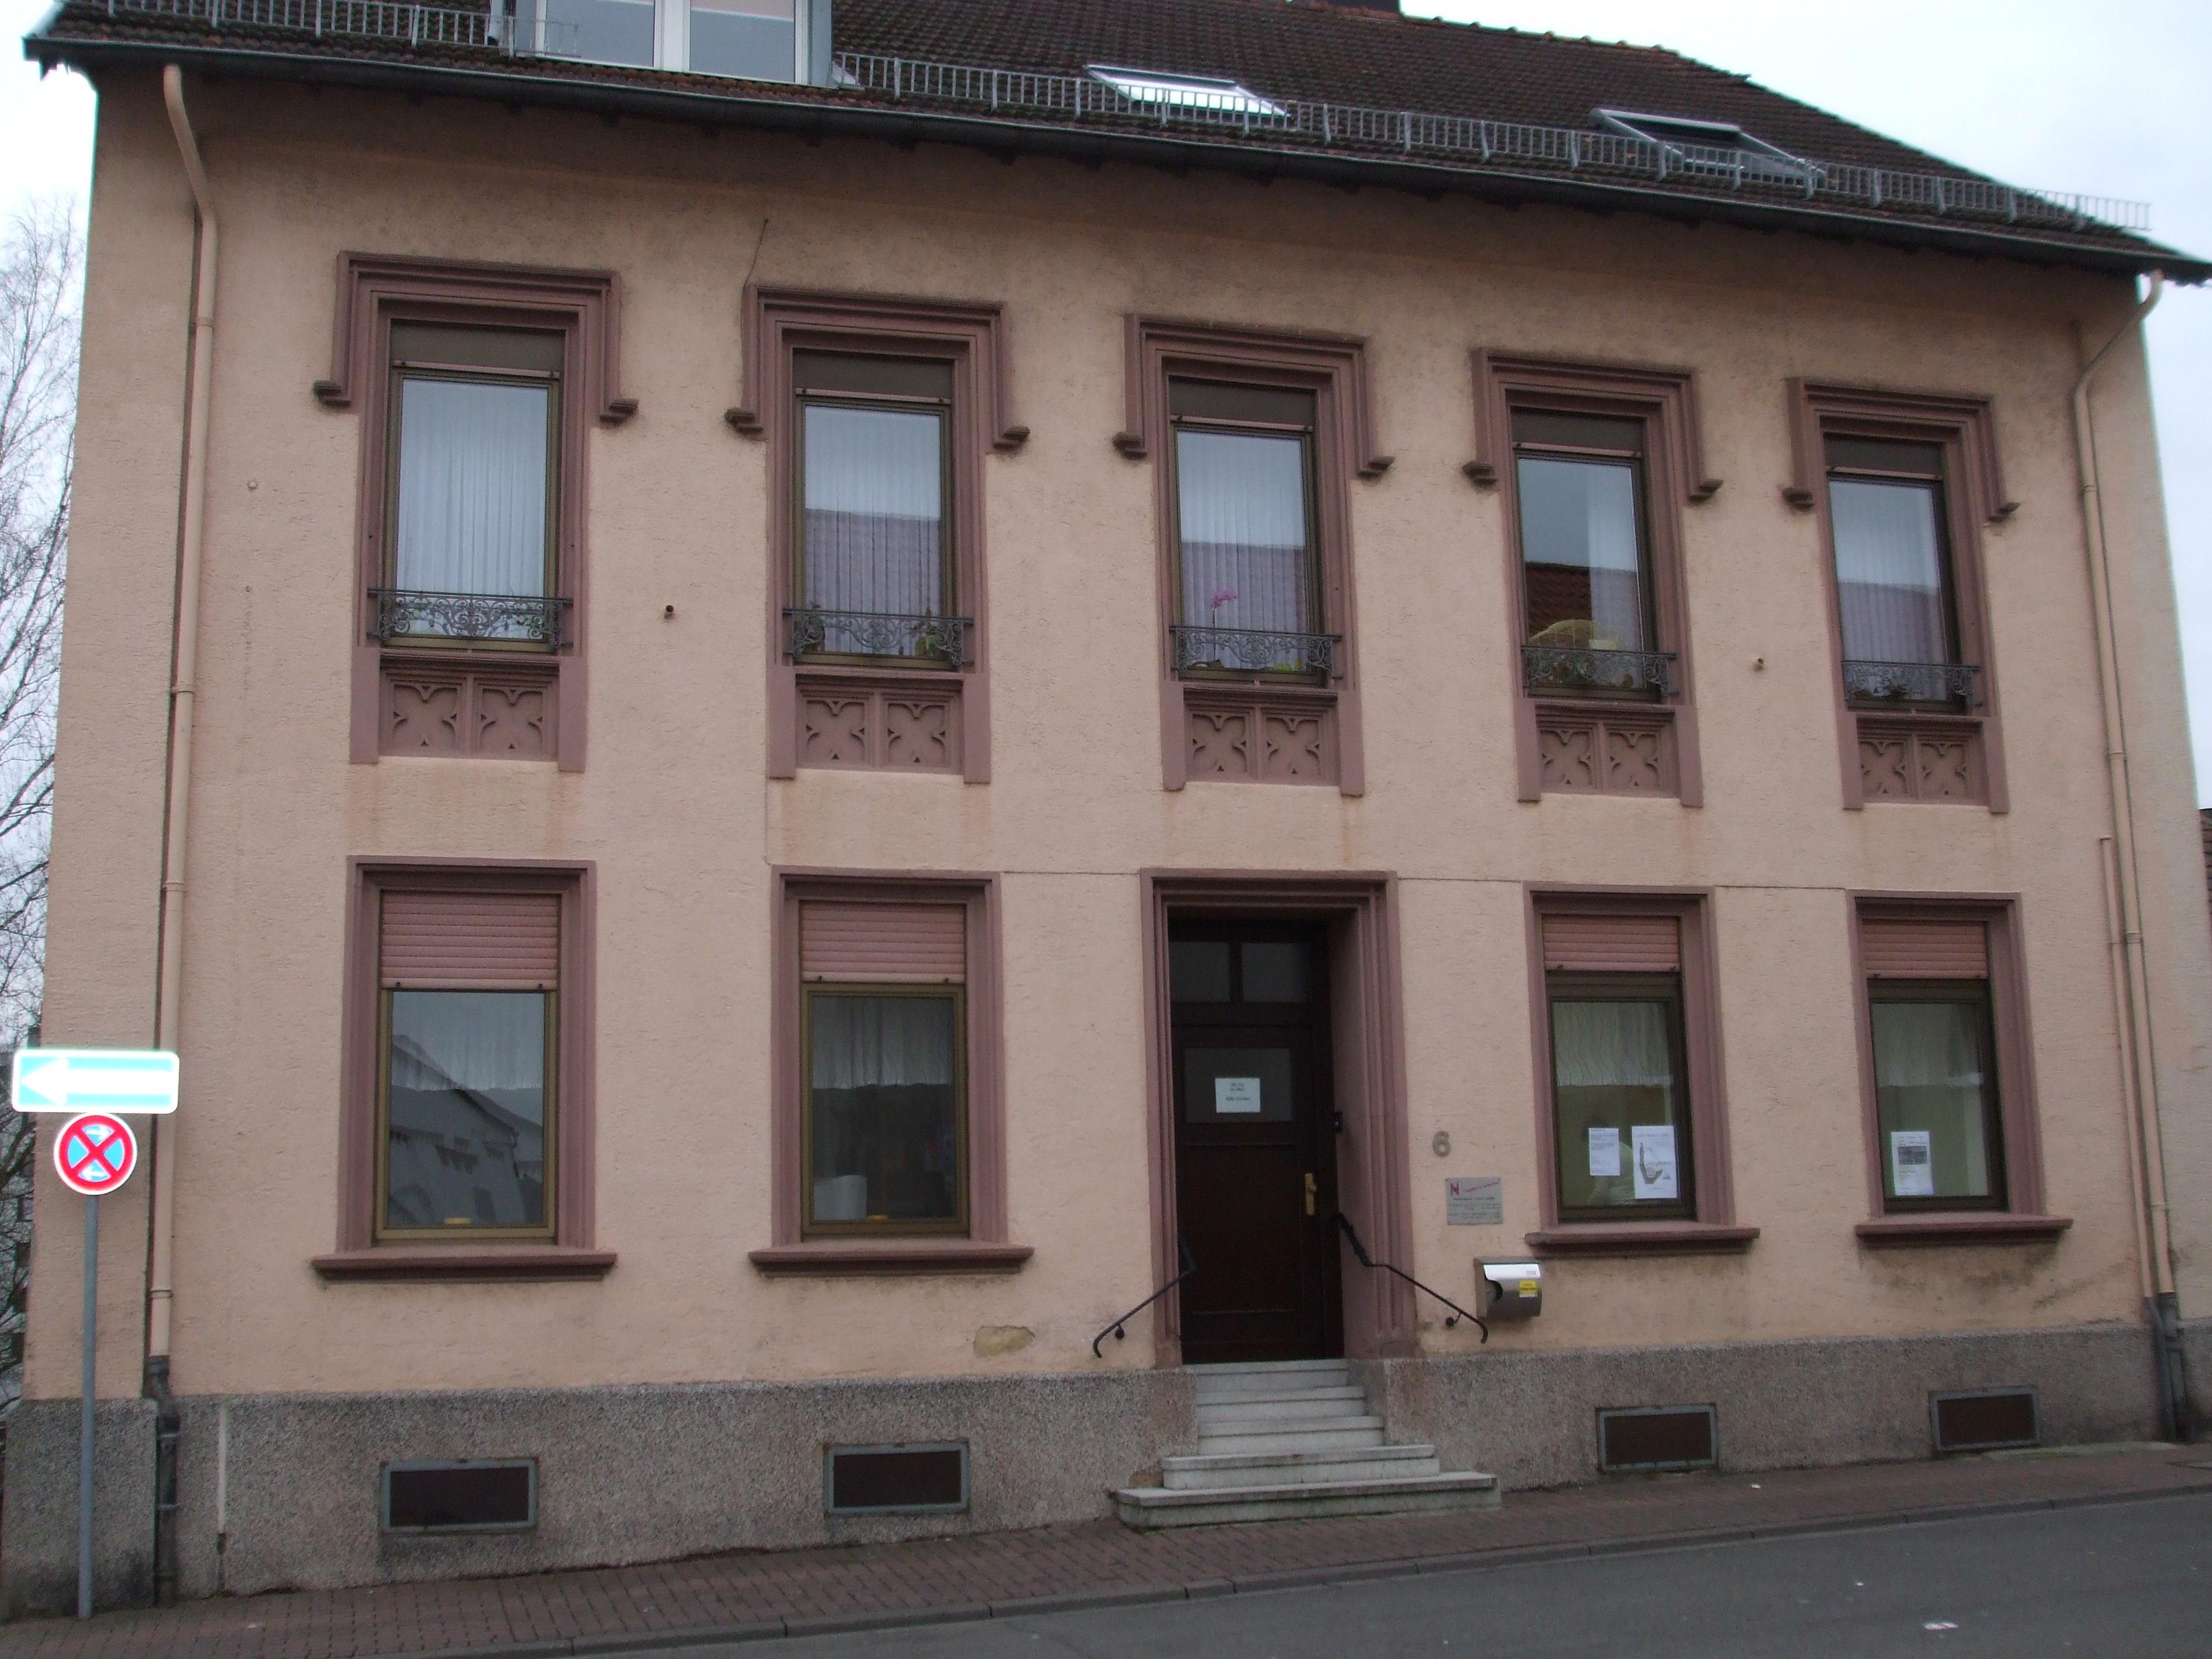 Gemeindeamt Neunkirchen Heizengasse 6,   66538 Neunkirchen